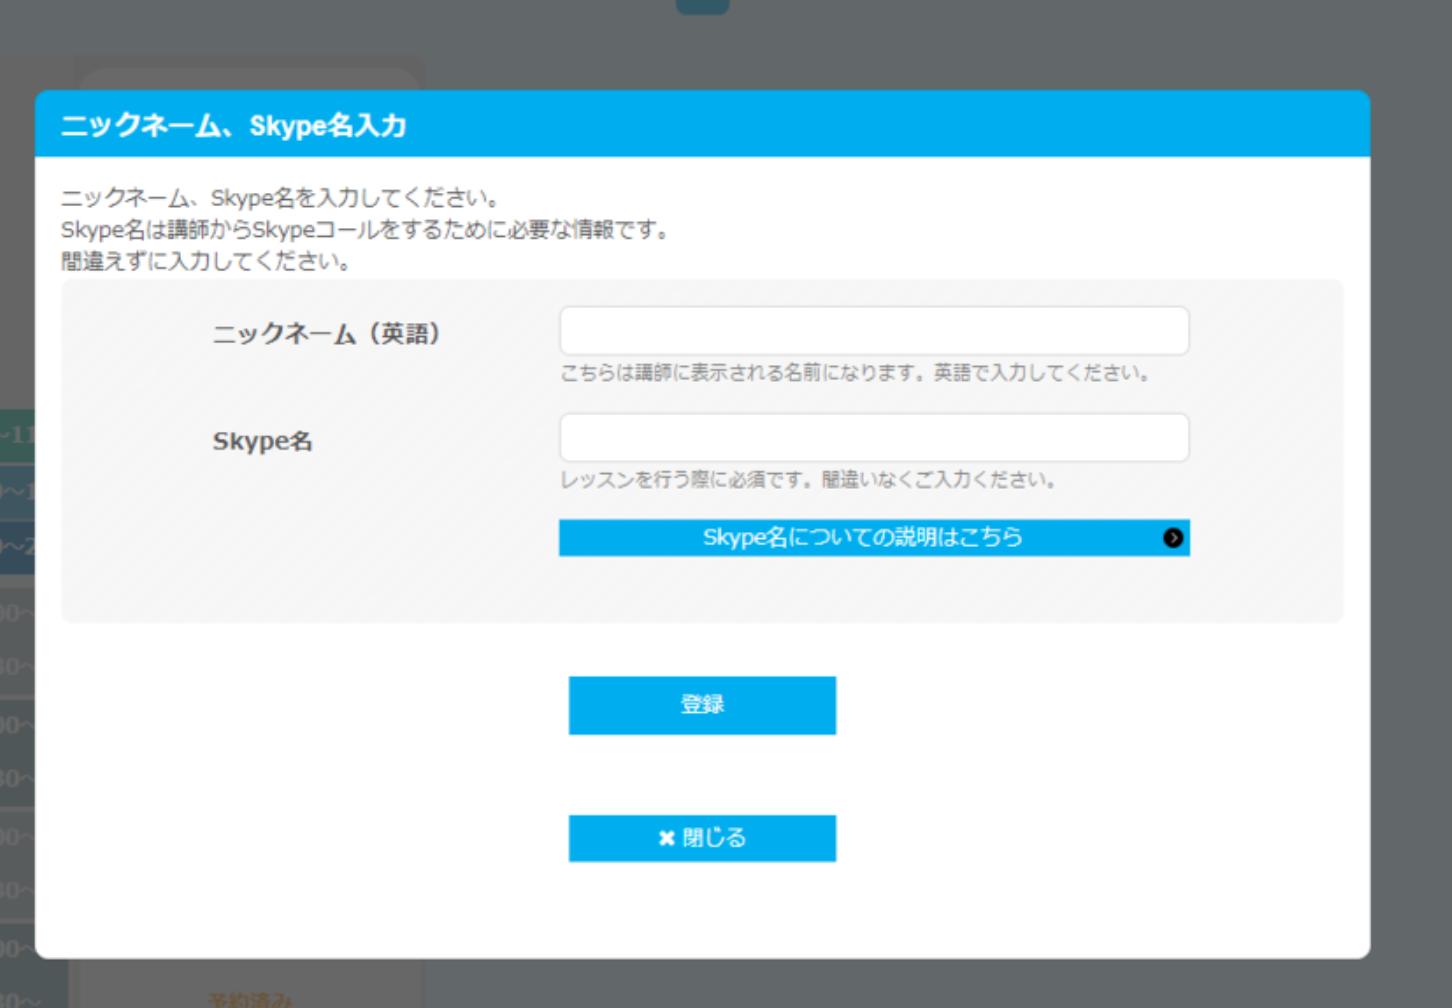 MakoStars LLC/ aRK4j8Odk7QdQS3DmG6Ks03edyGU1d1RPPaYxa5Nqb0DYroB5RVnYGjDmmSr5B3LNXNIJ3gt5nMyCBs2NebPVMyWRLYF5l8YBBQovycPqOnVLA